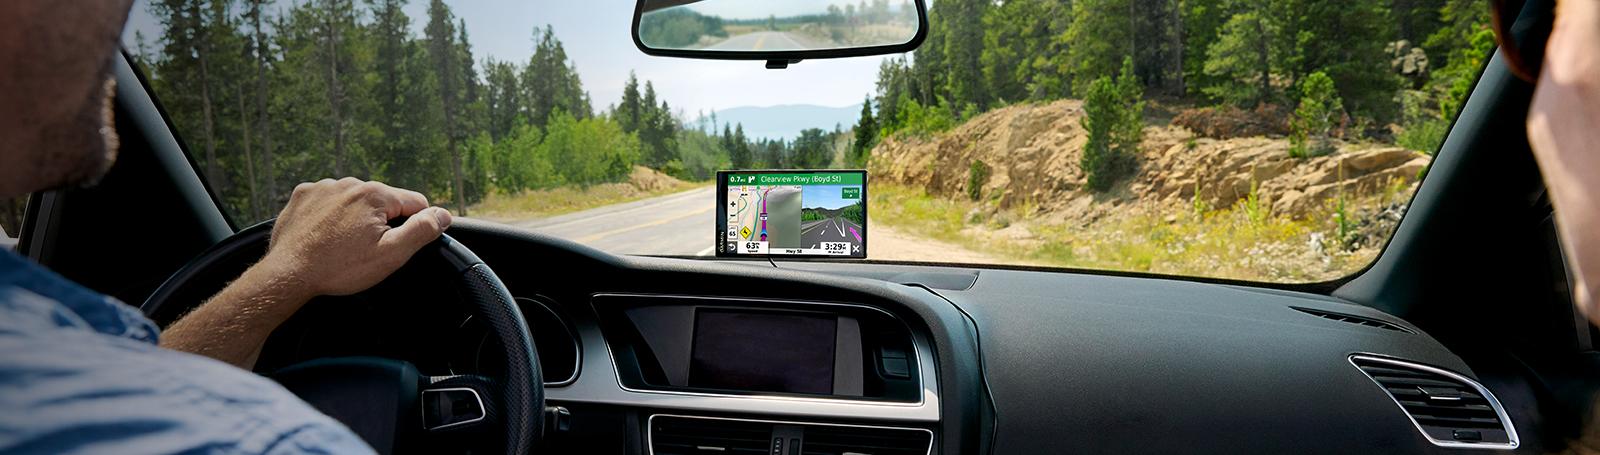 GPS Garmin DriveSmart 65 - Test & Avis - Mon GPS Avis.fr